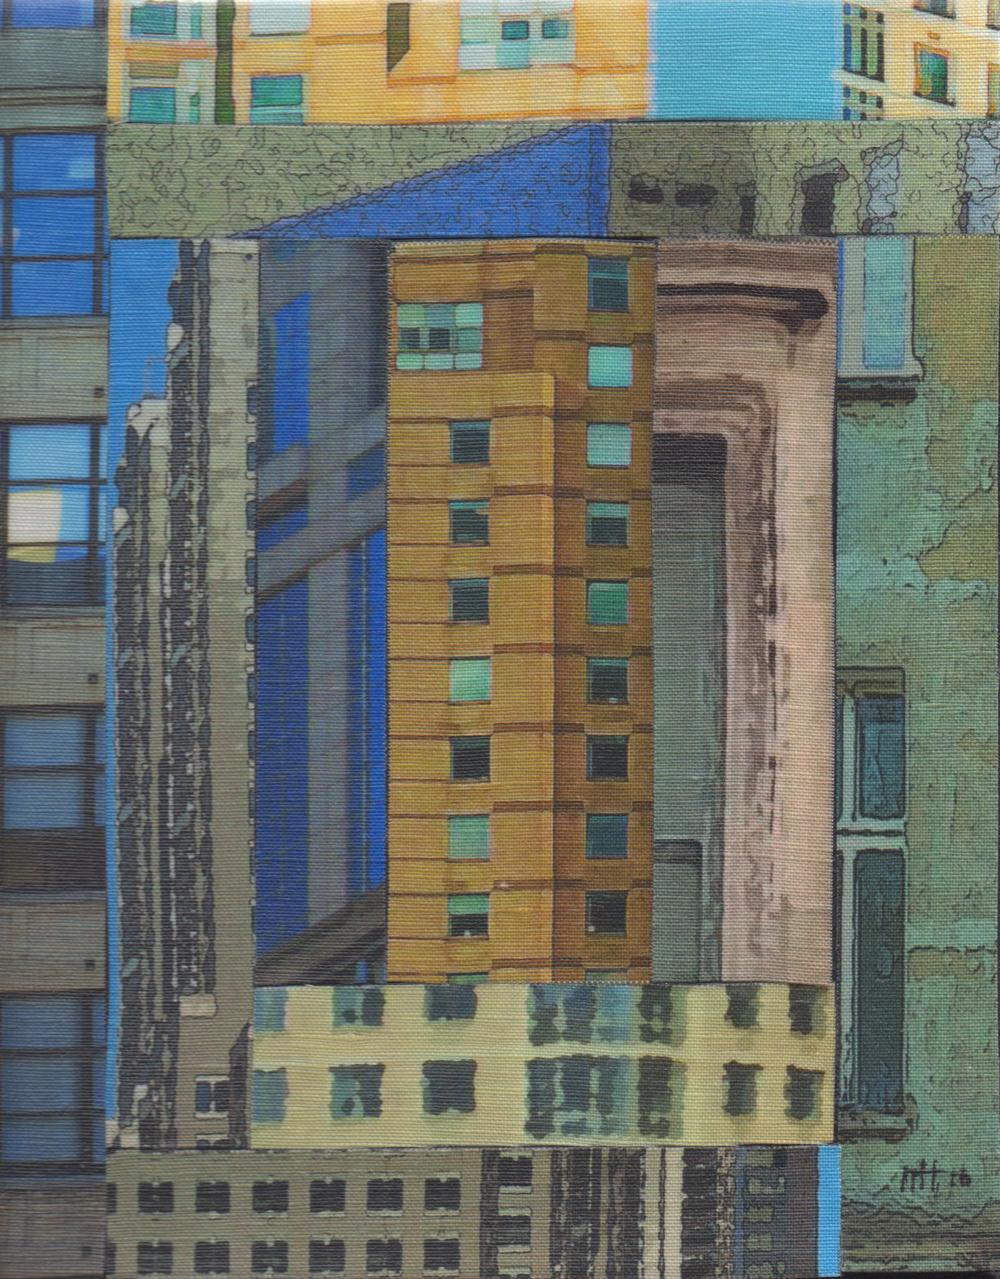 patchwork city 47